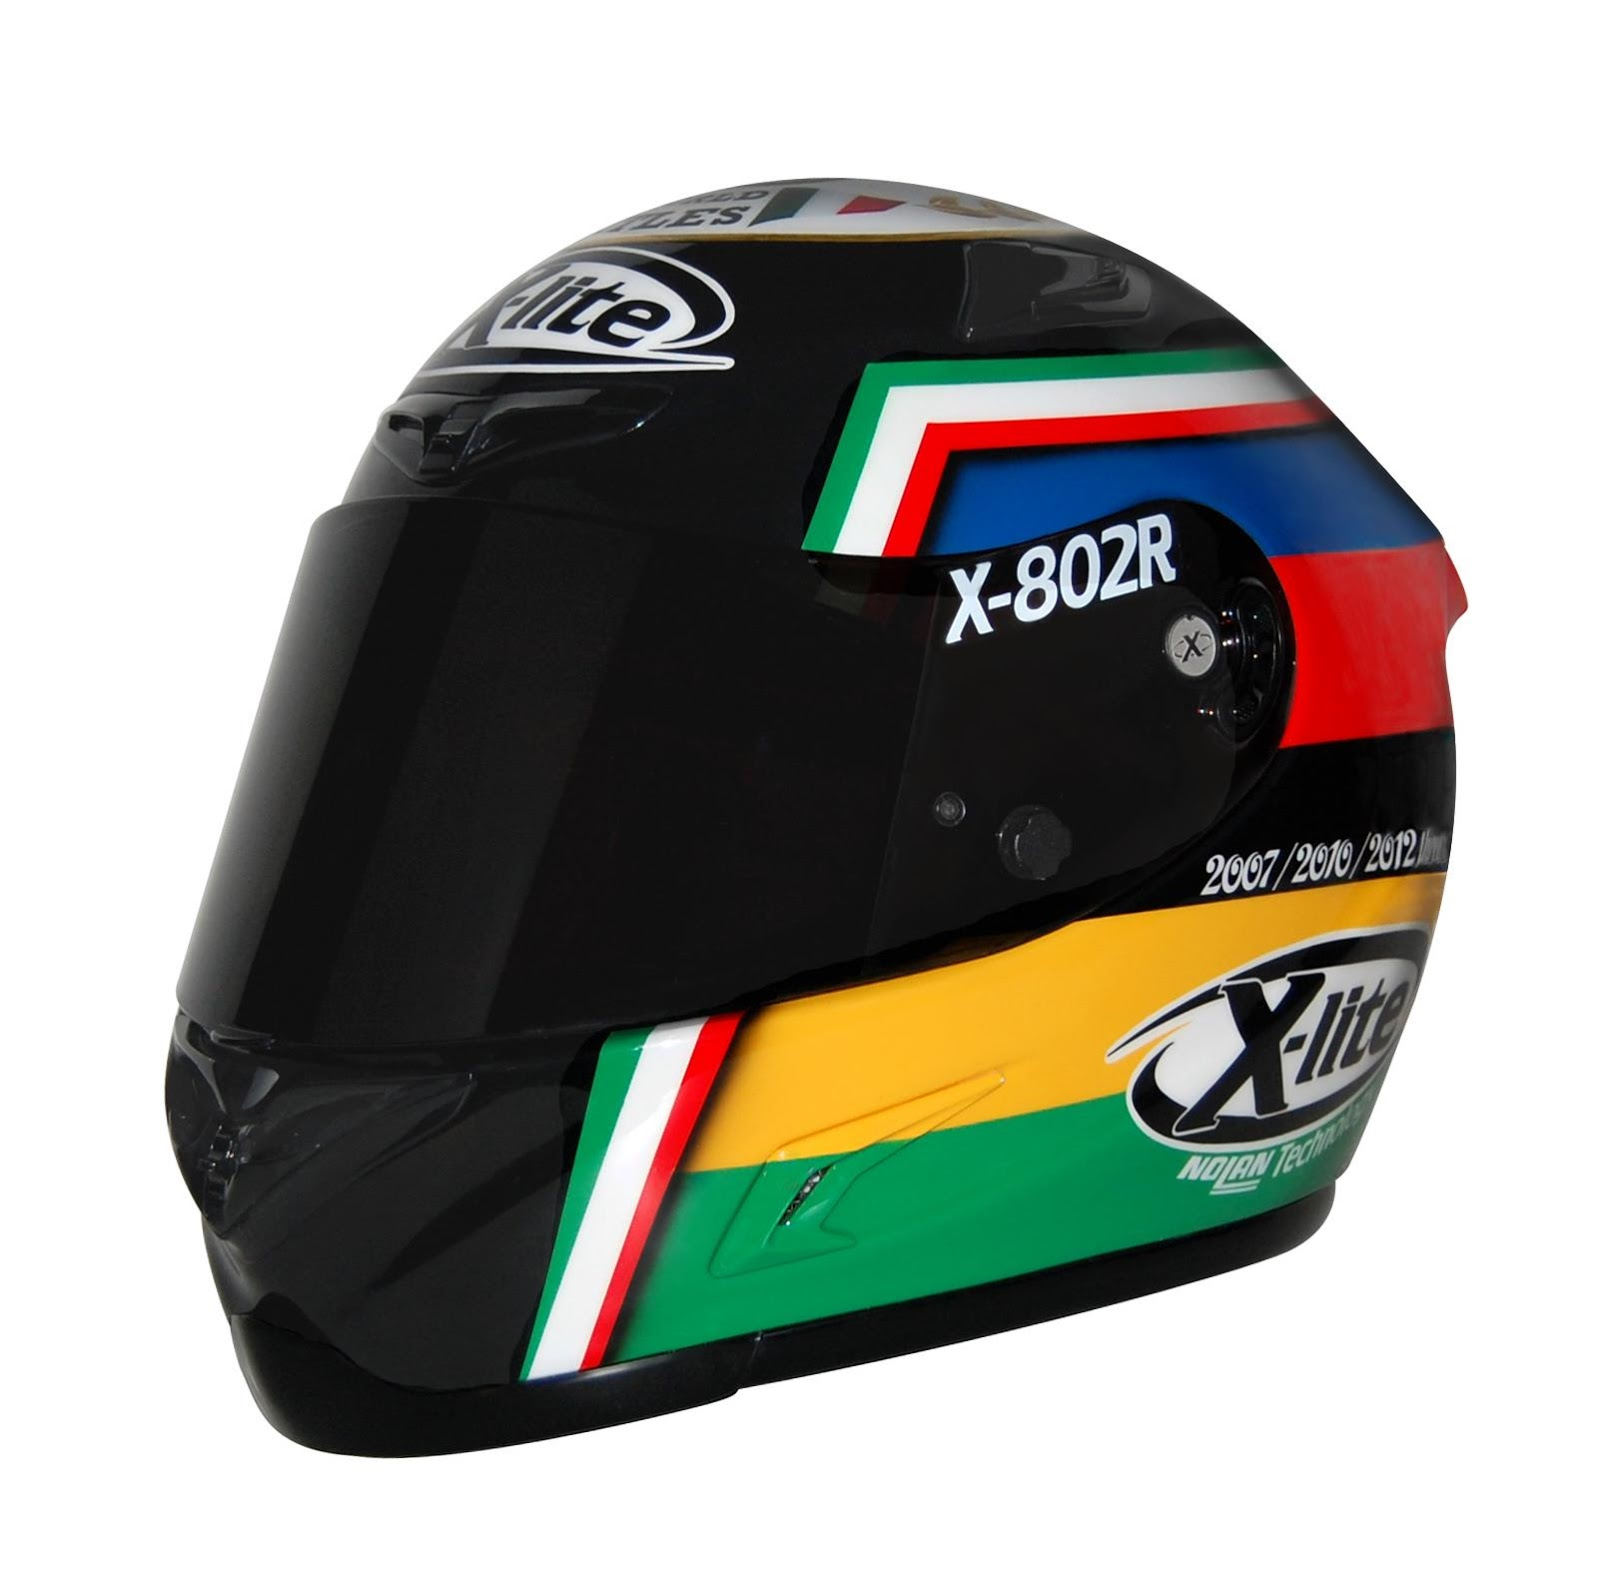 racing helmets garage x lite x 802r j lorenzo 3 world. Black Bedroom Furniture Sets. Home Design Ideas